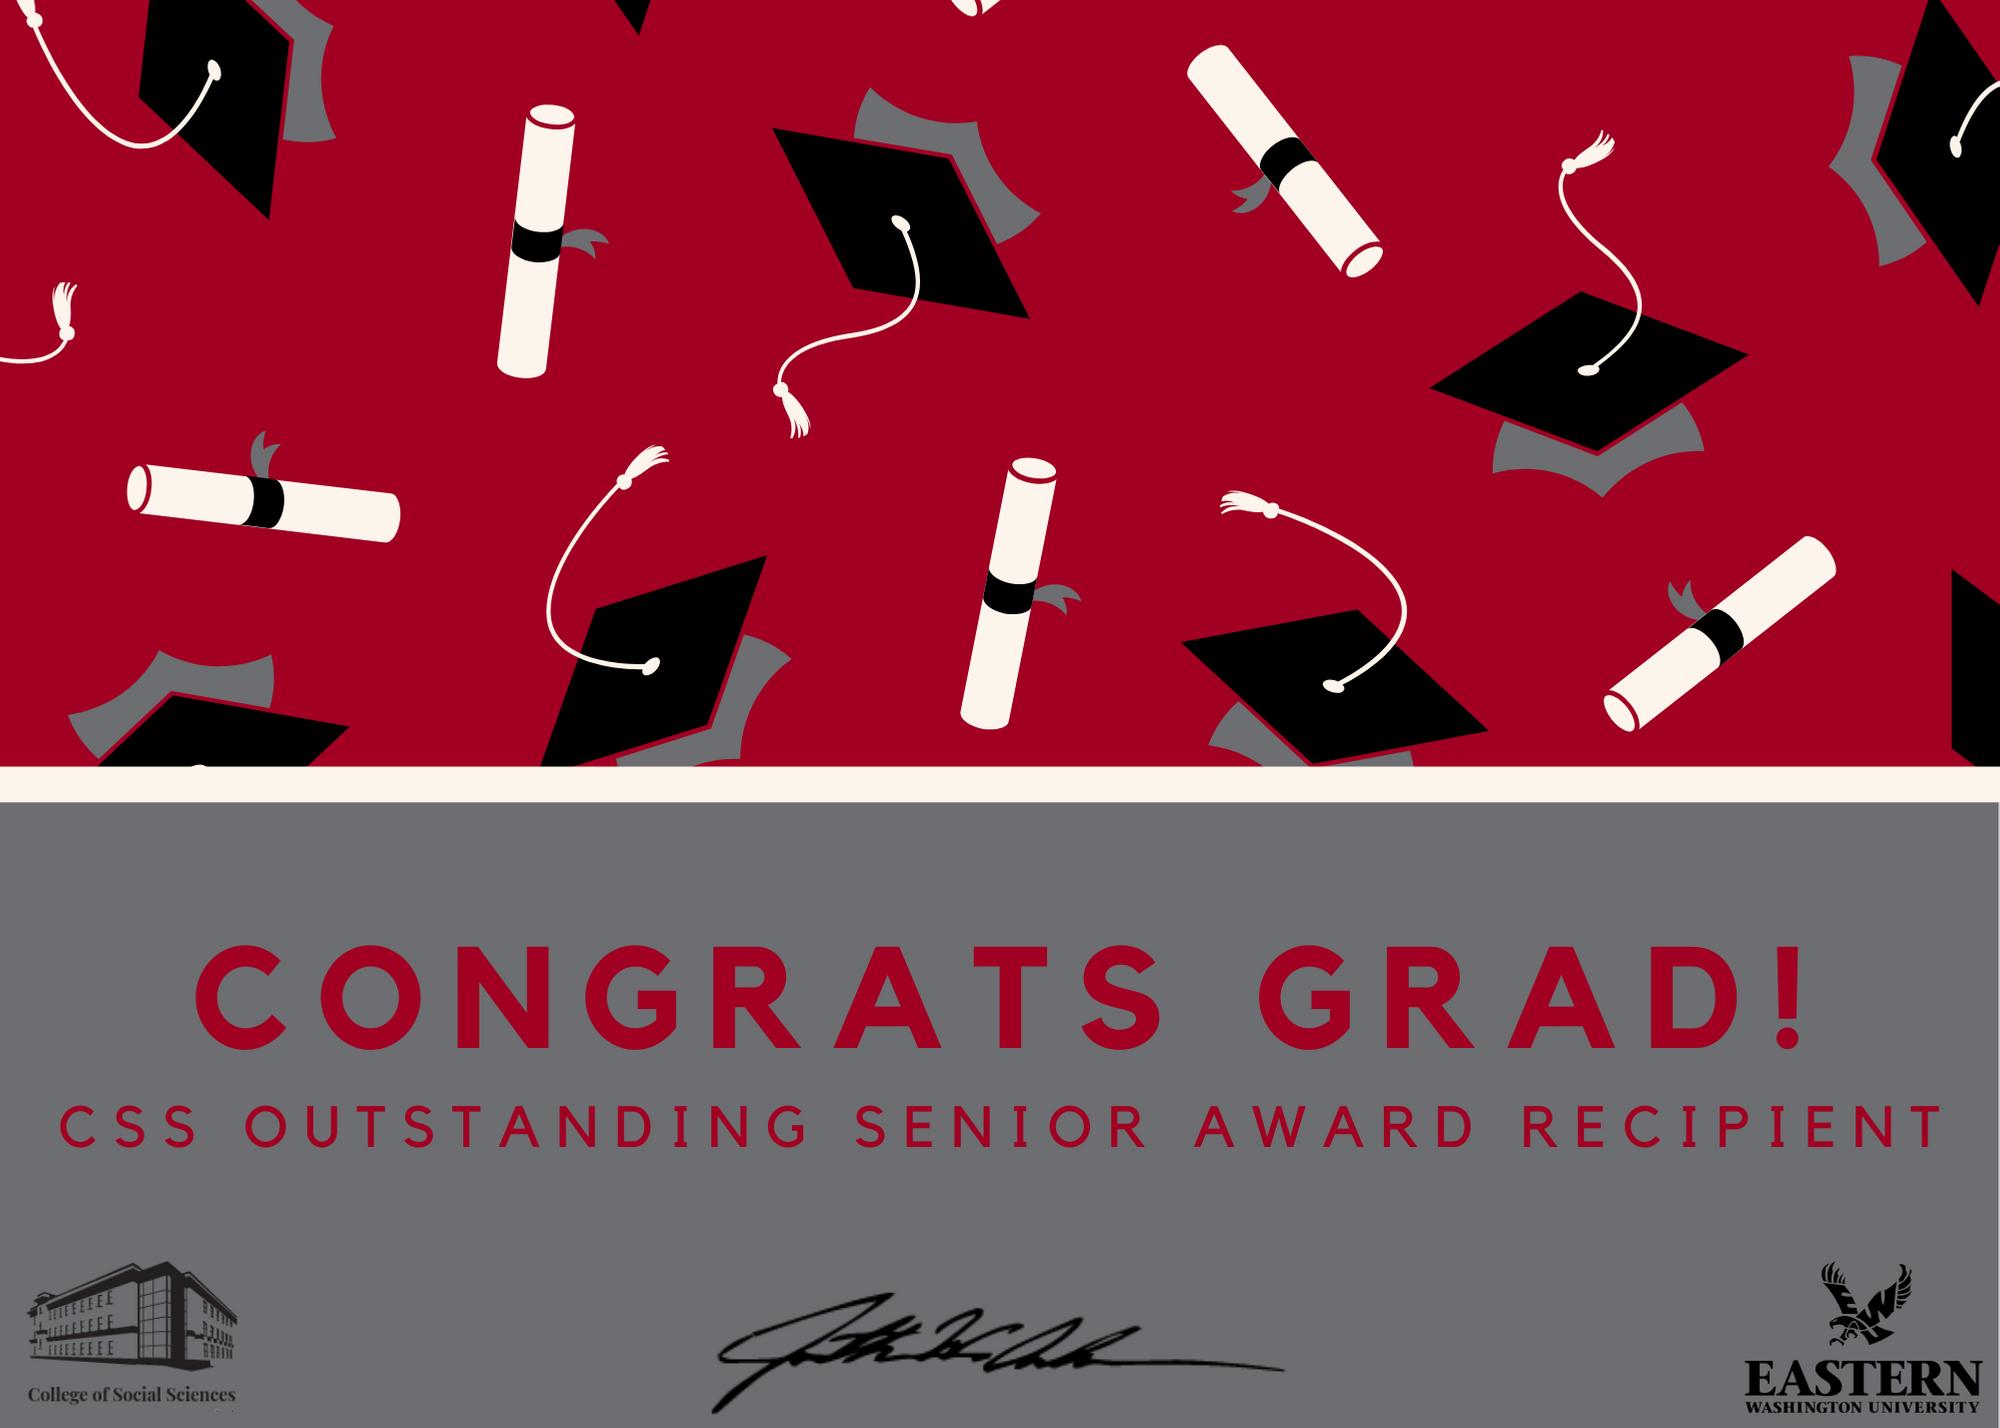 2360-caps-and-diplomas-pattern-graduation-card-2.png